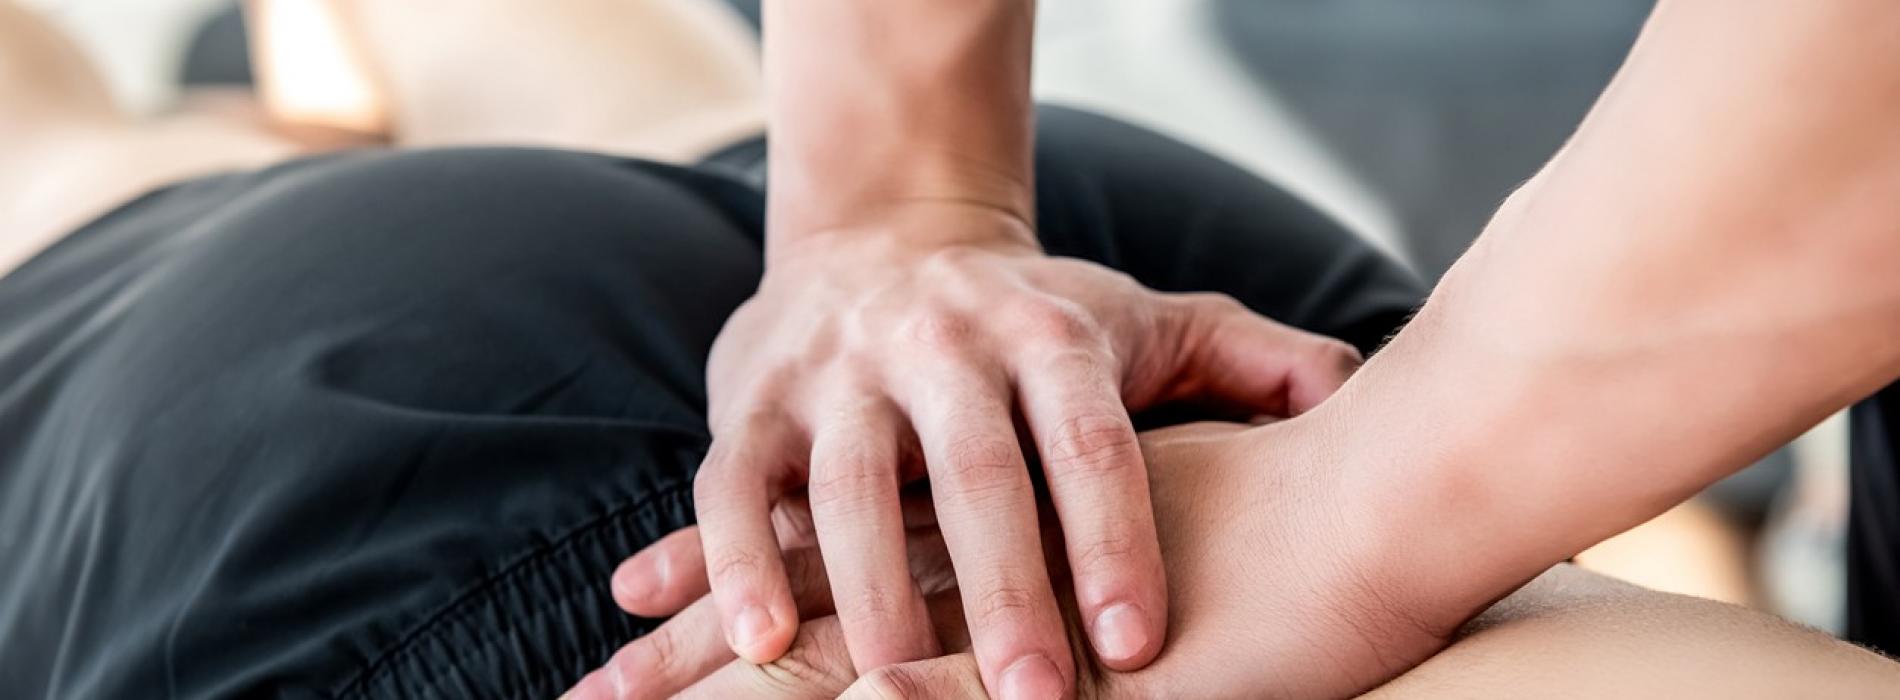 Uses Of Sports Massage Singapore Treatments